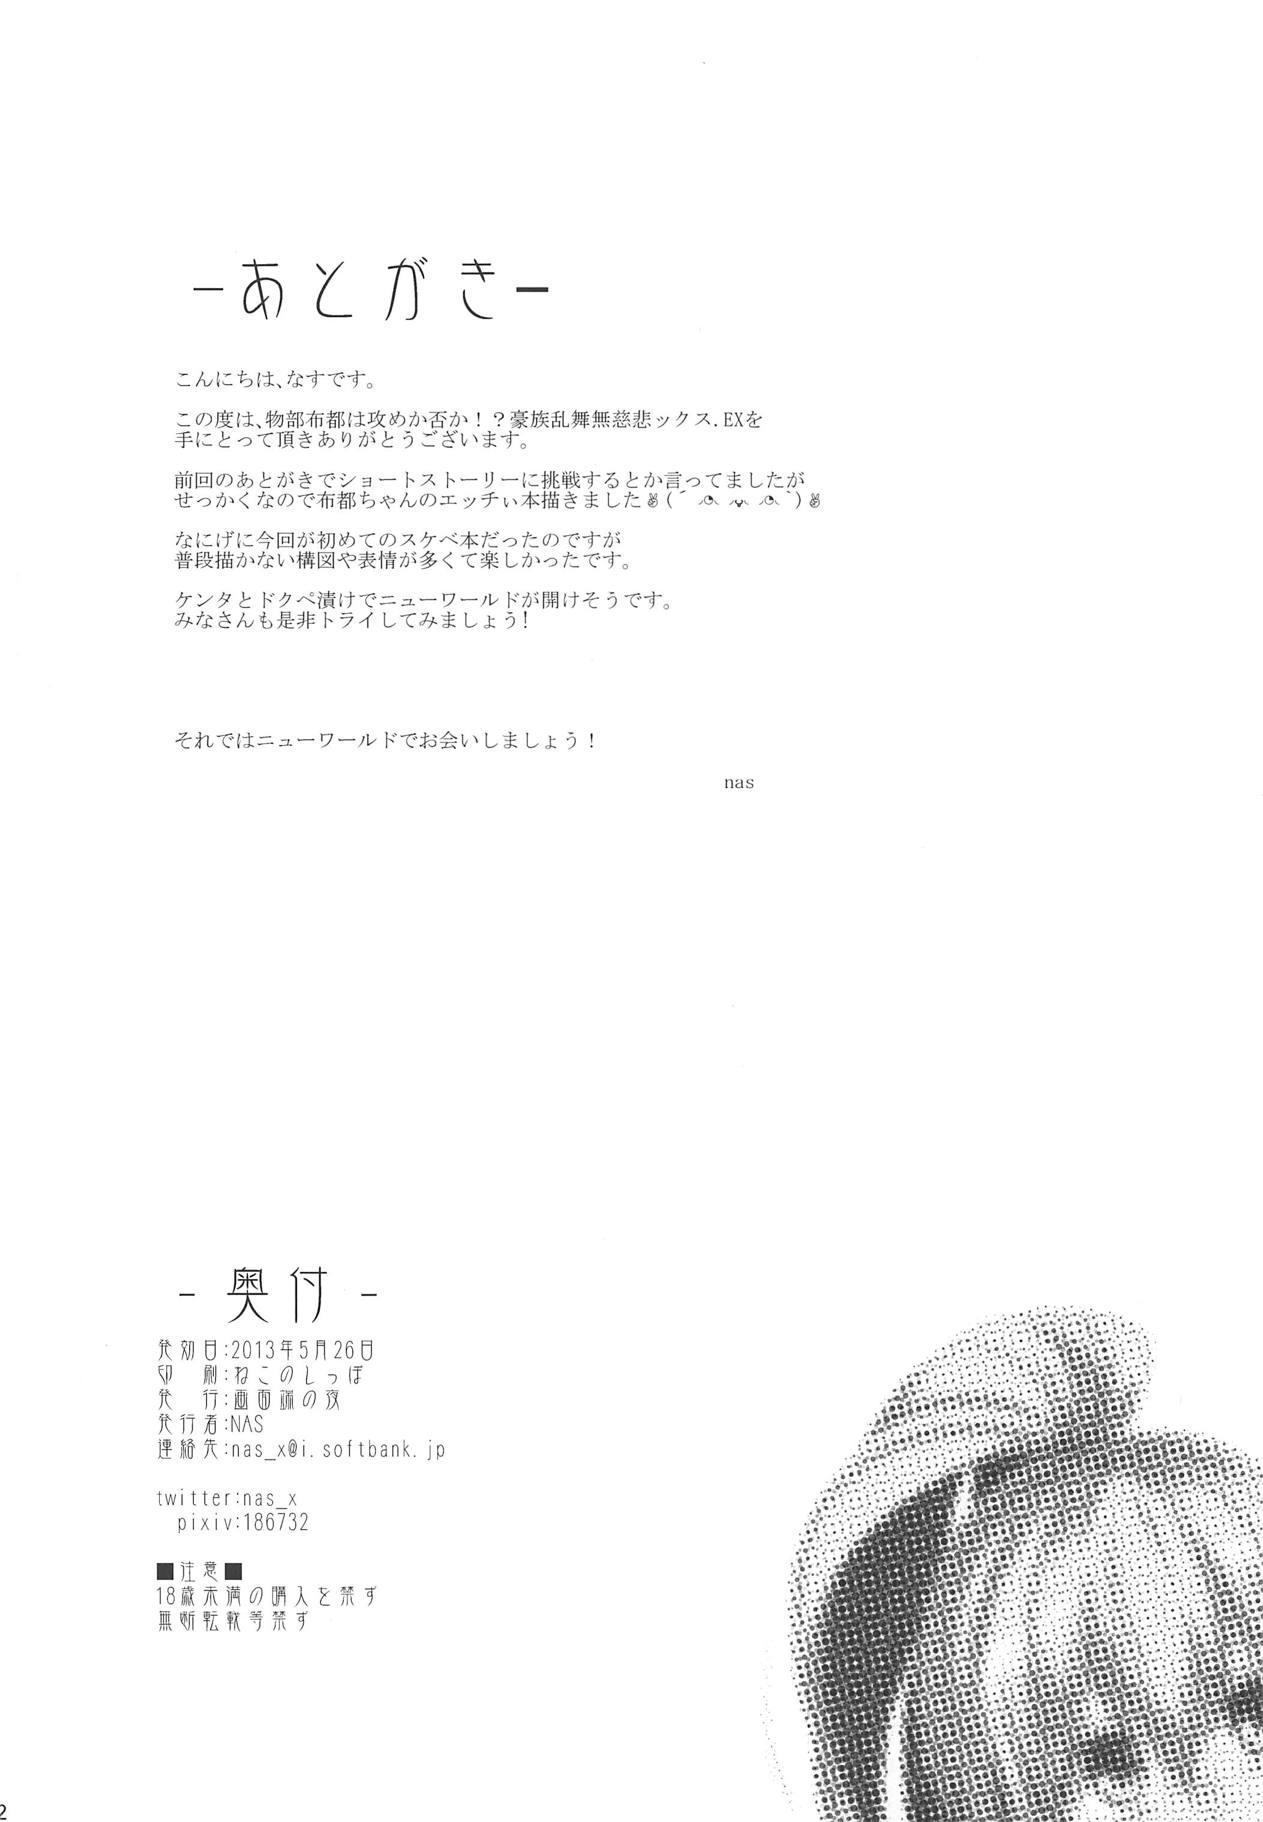 Gouzoku Ranbu Mujihix EX. 12